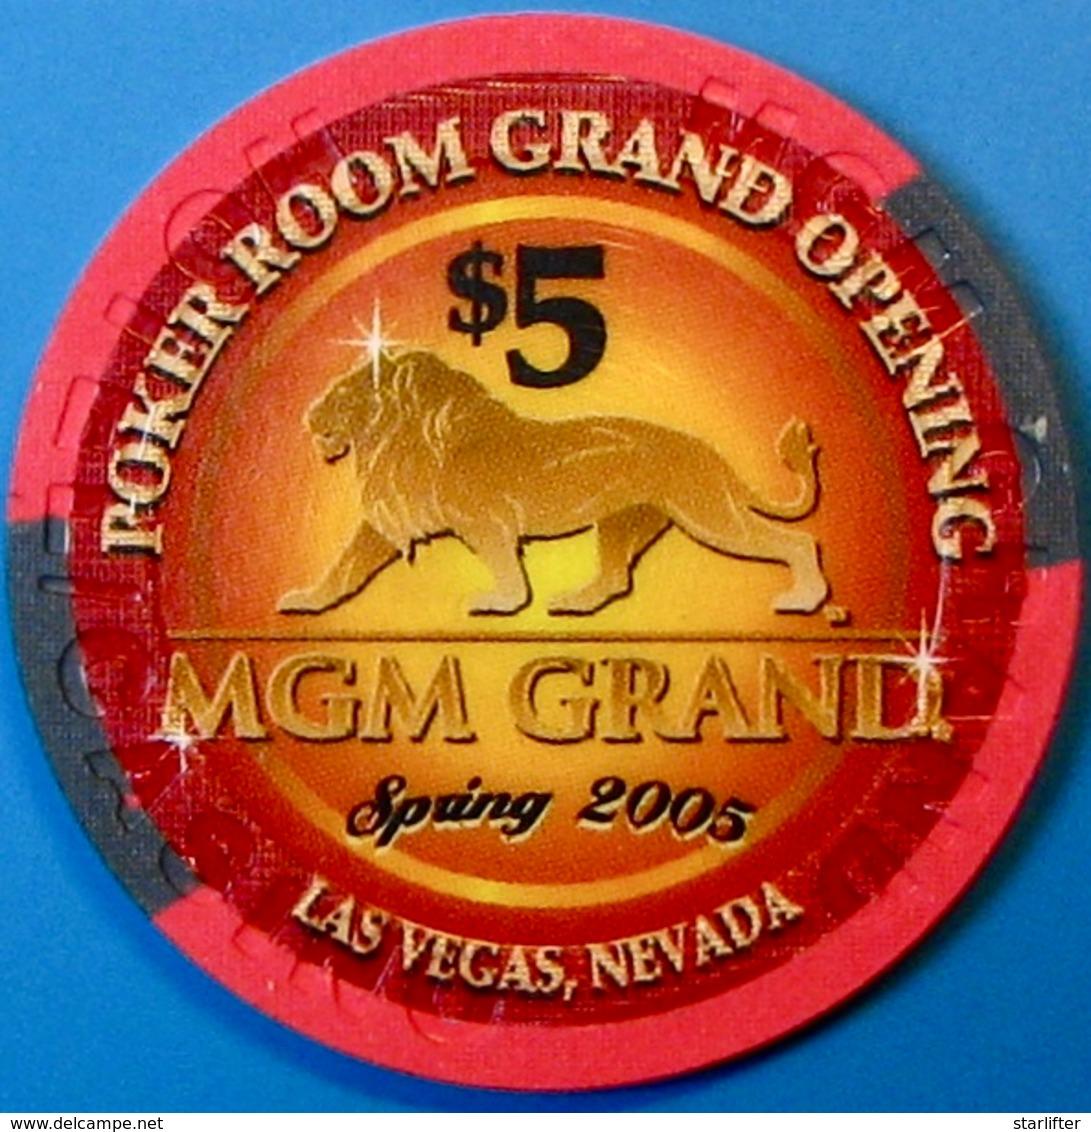 $5 Casino Chip. MGM Grand, Las Vegas, NV. Poker Room Grand Opening 2005. M72. - Casino